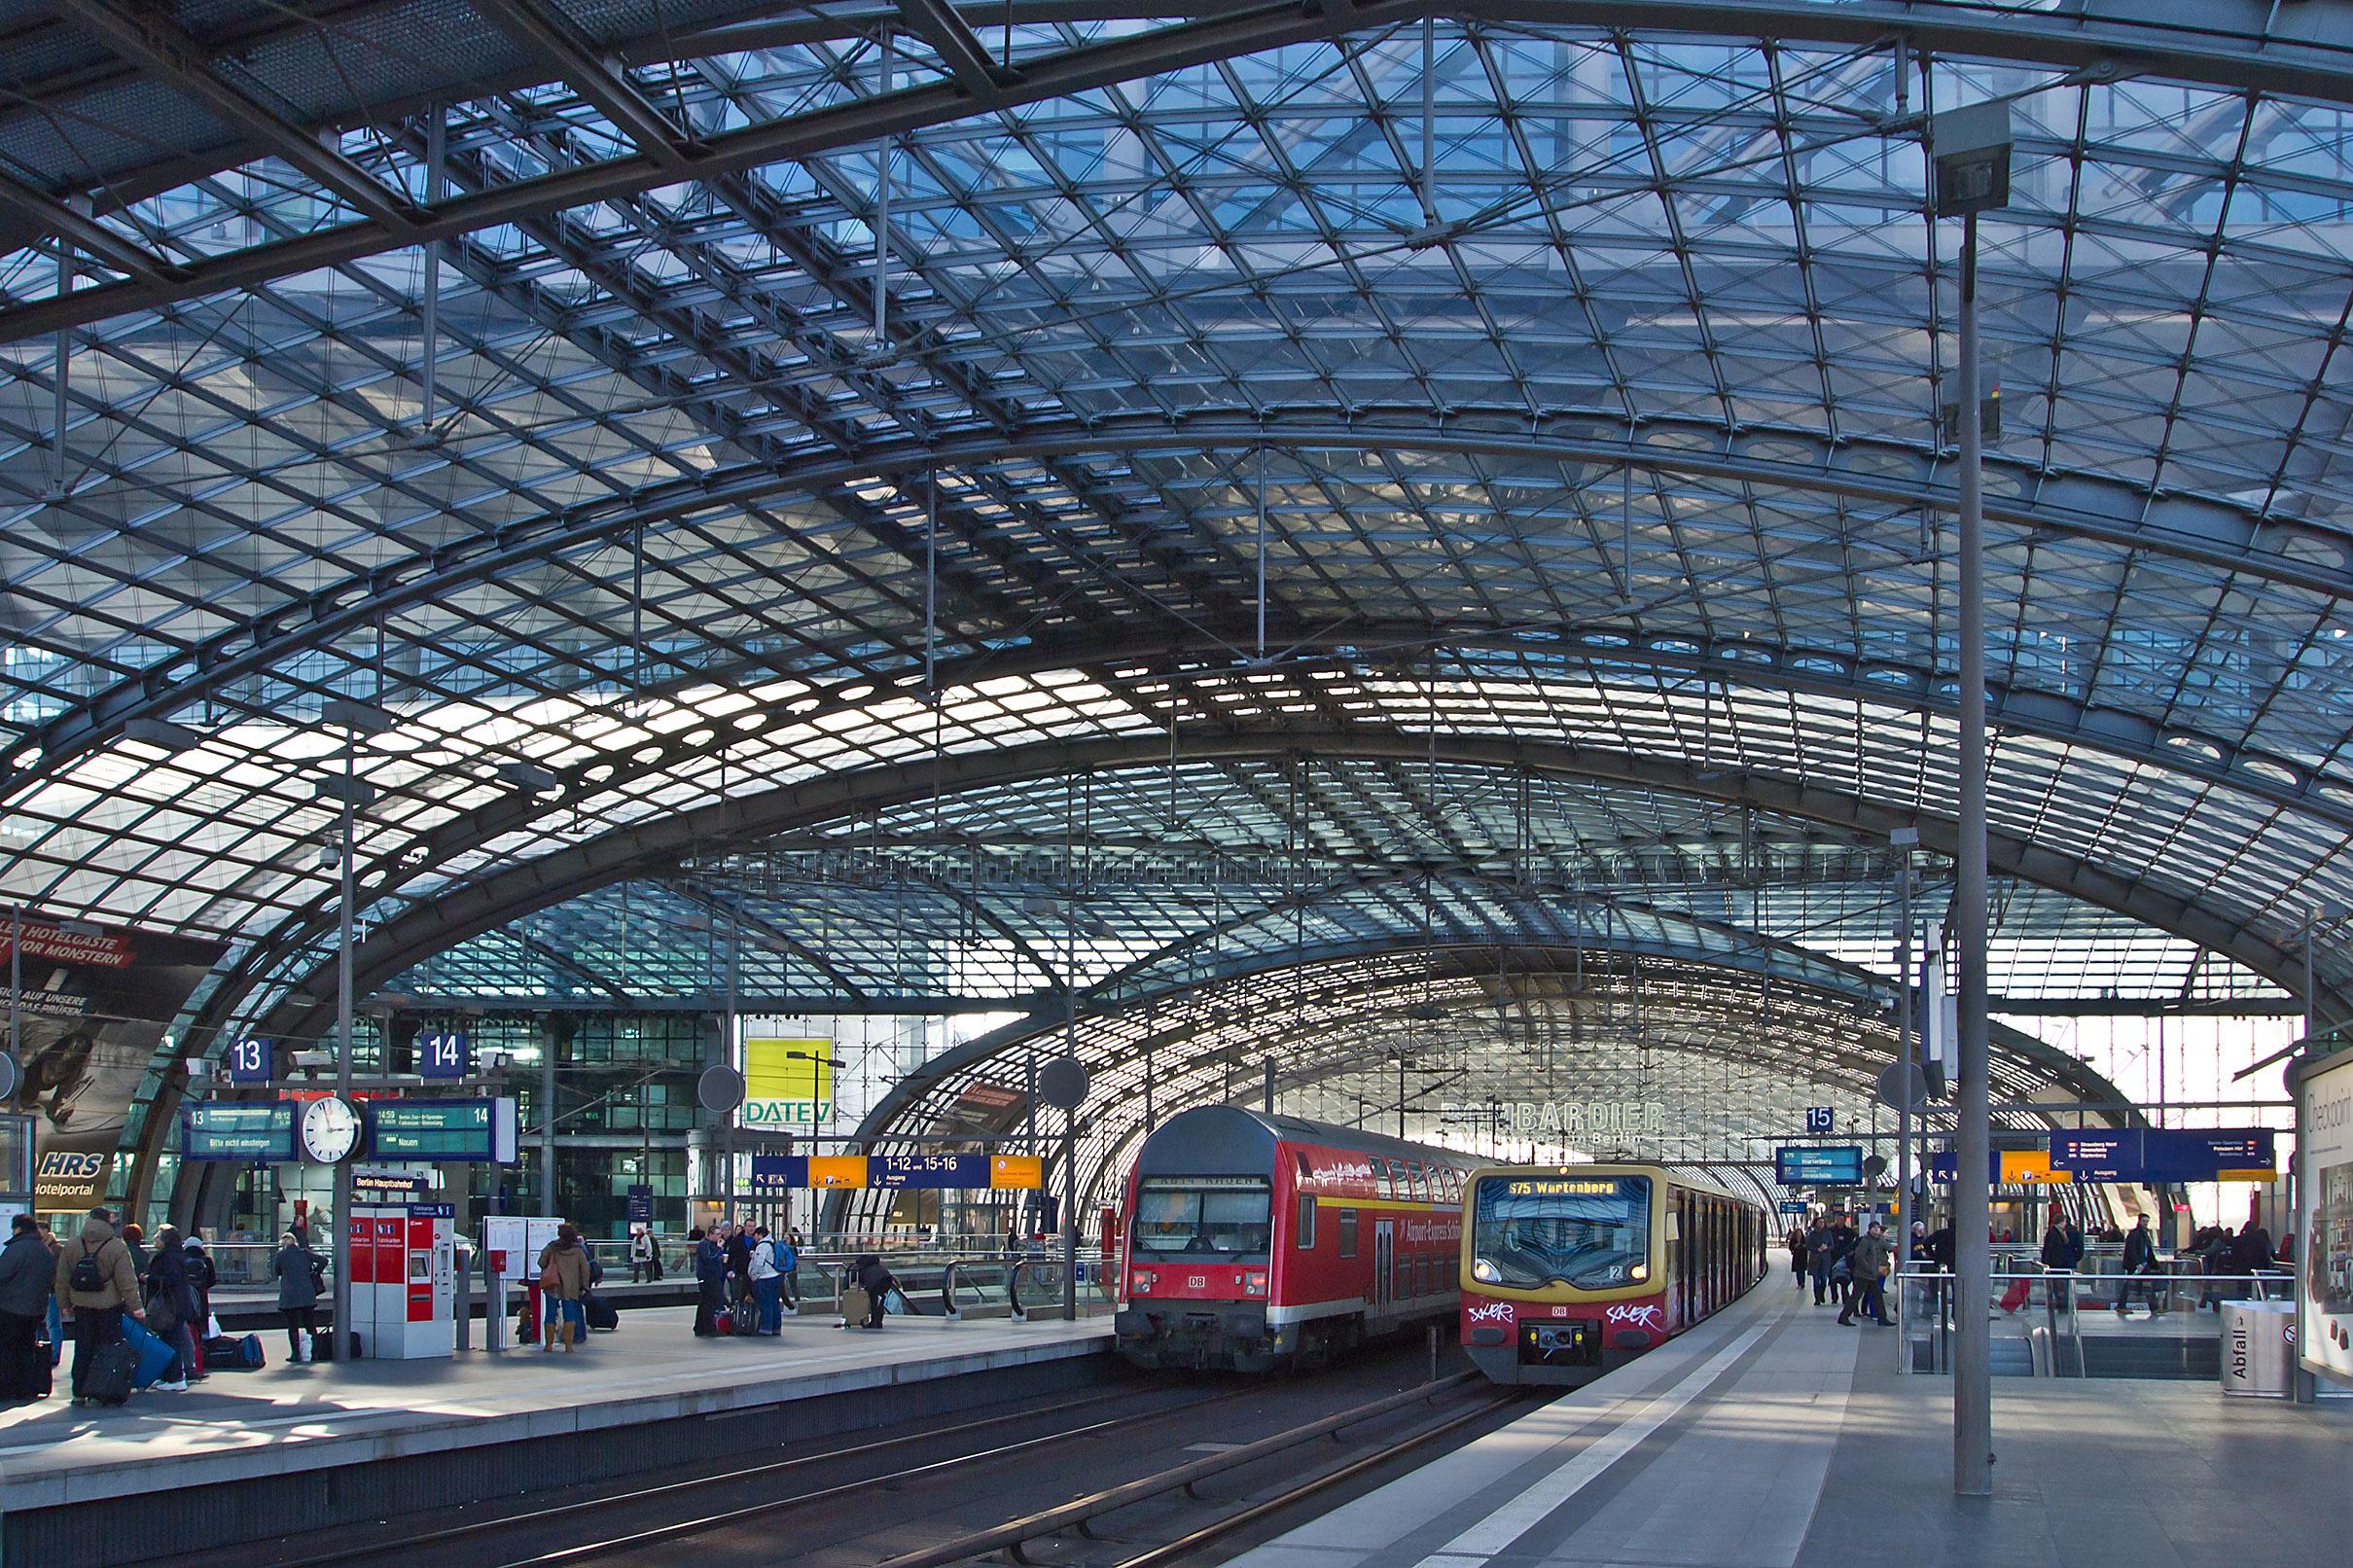 s bahn and db regionalbahn at berlin hauptbahnhof central station trains. Black Bedroom Furniture Sets. Home Design Ideas